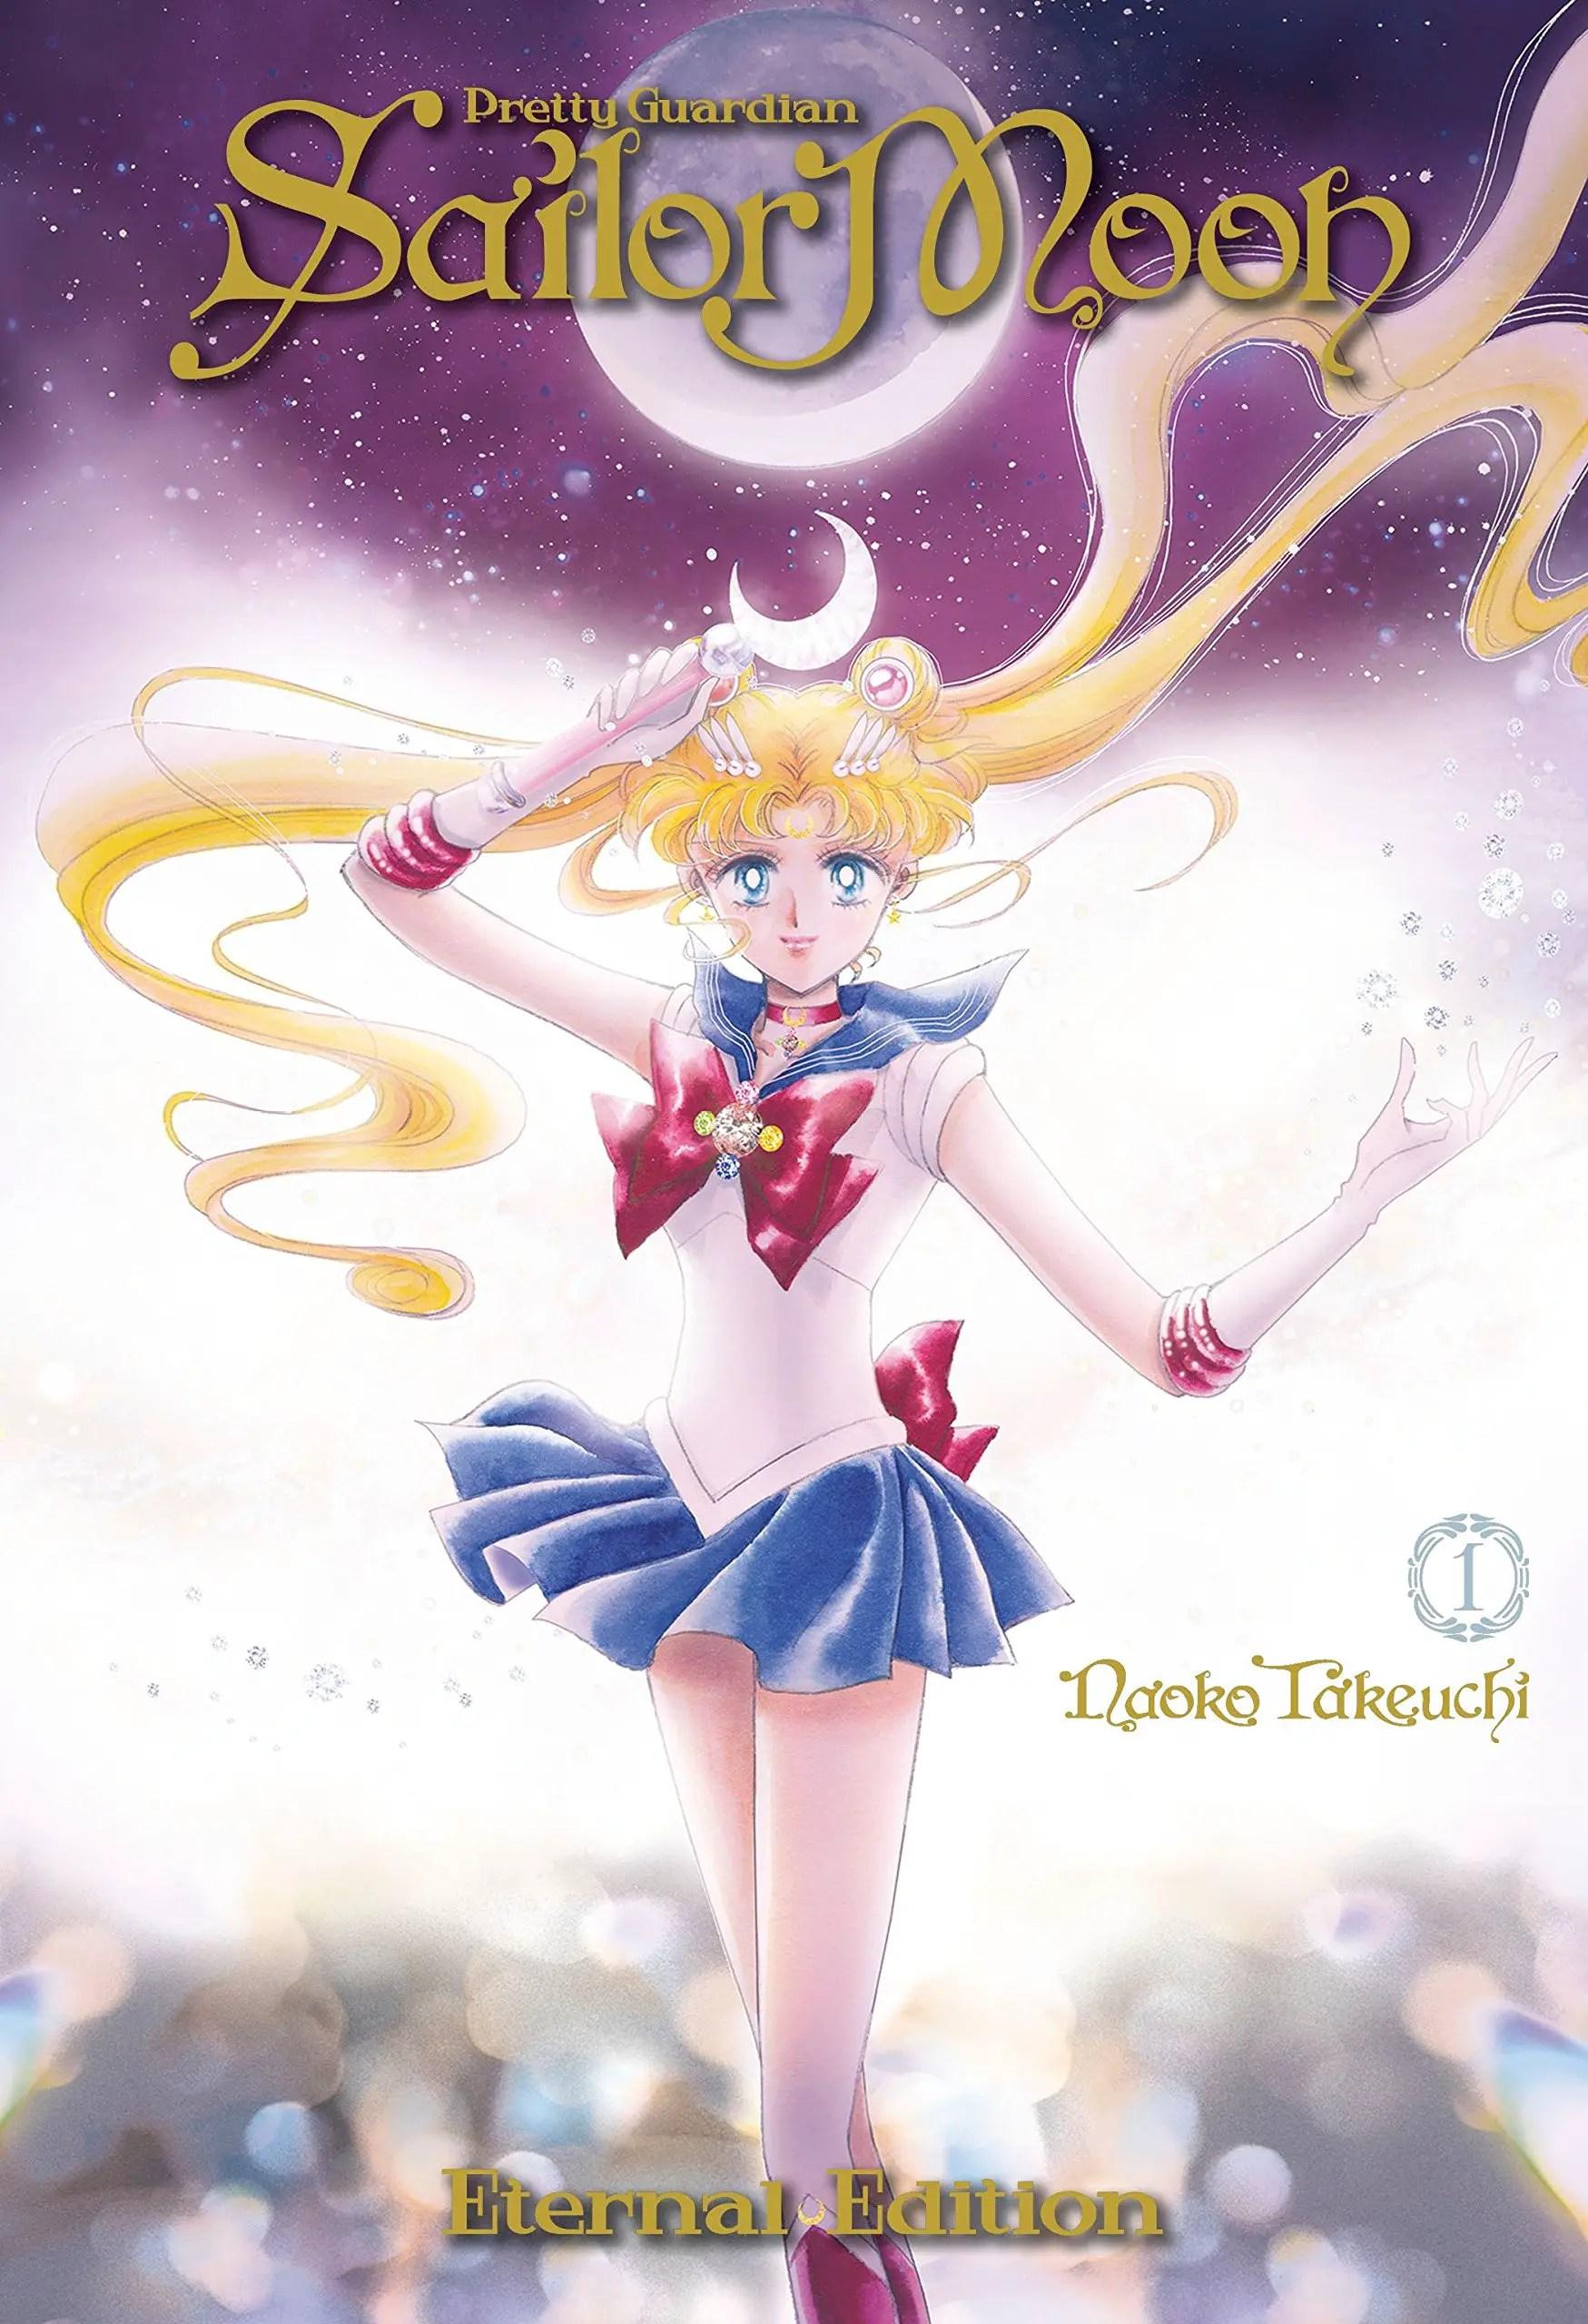 Sailor Moon Eternal Edition Vol. 1 Review